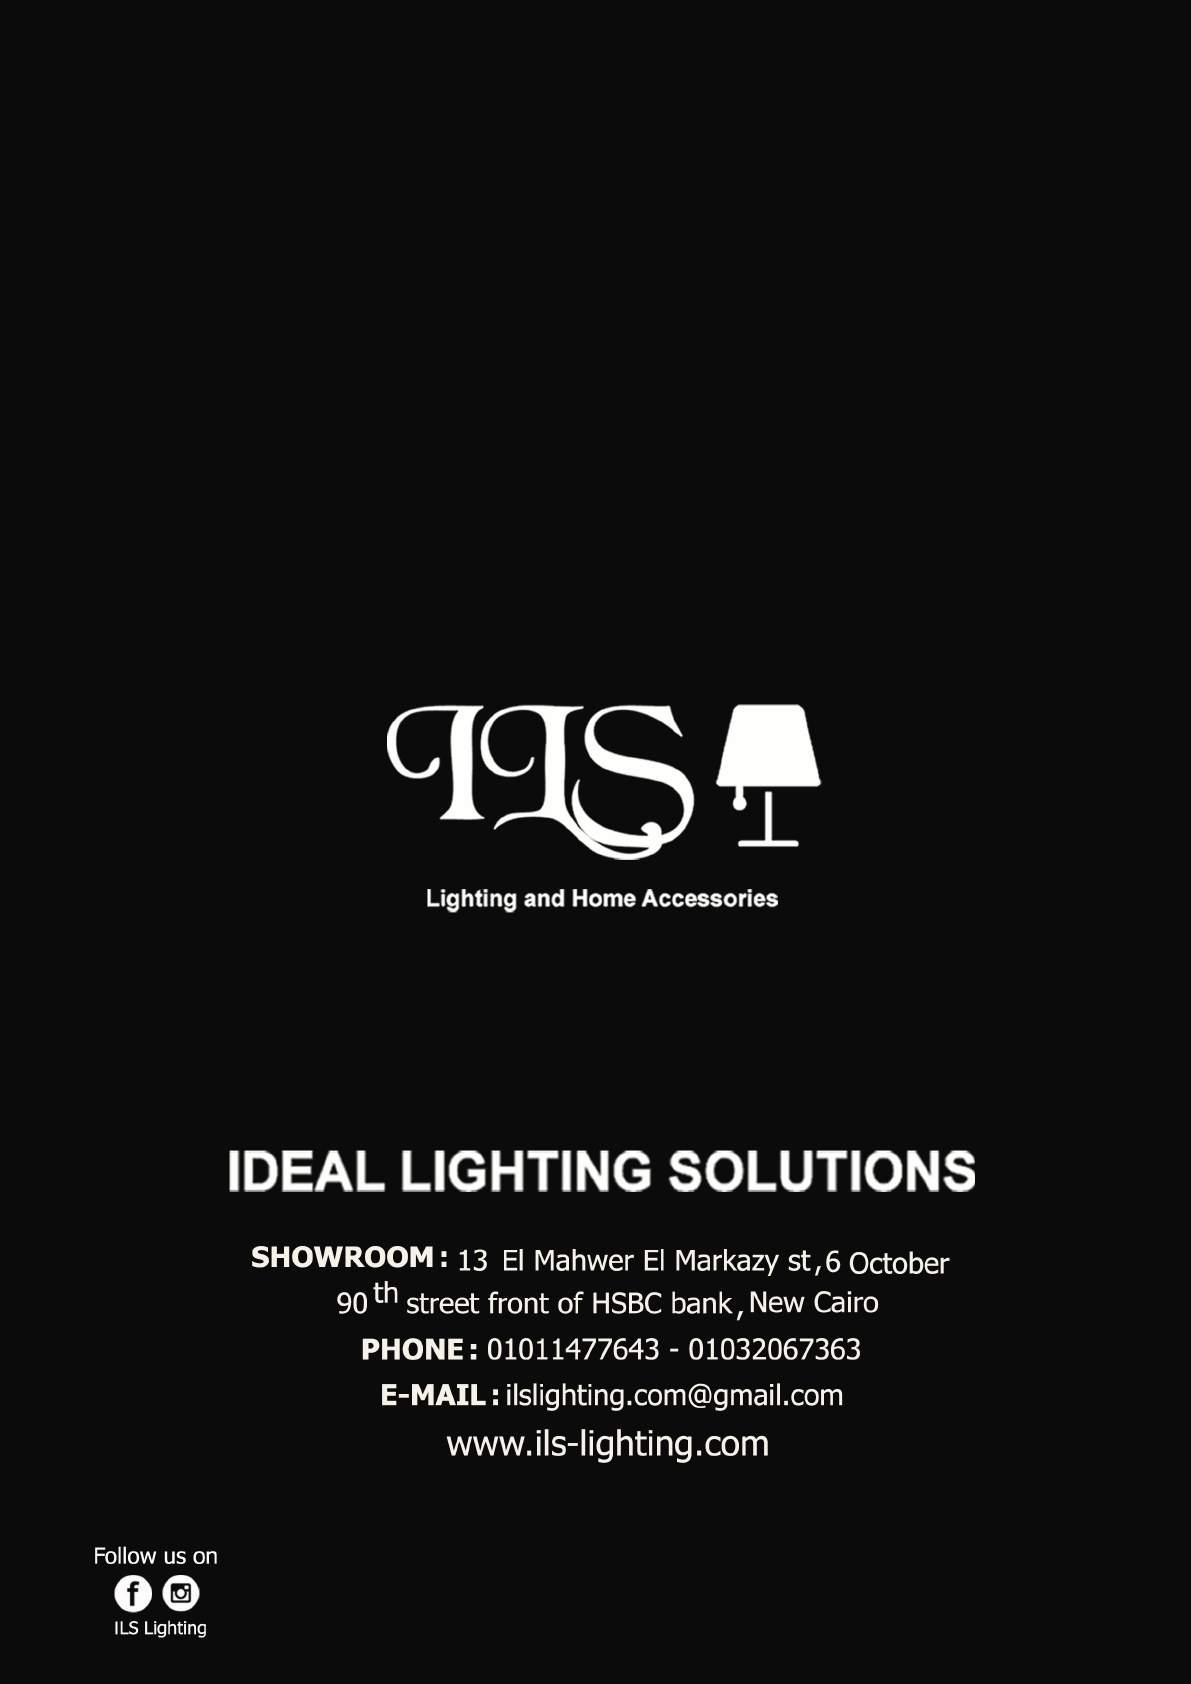 ILS lighting